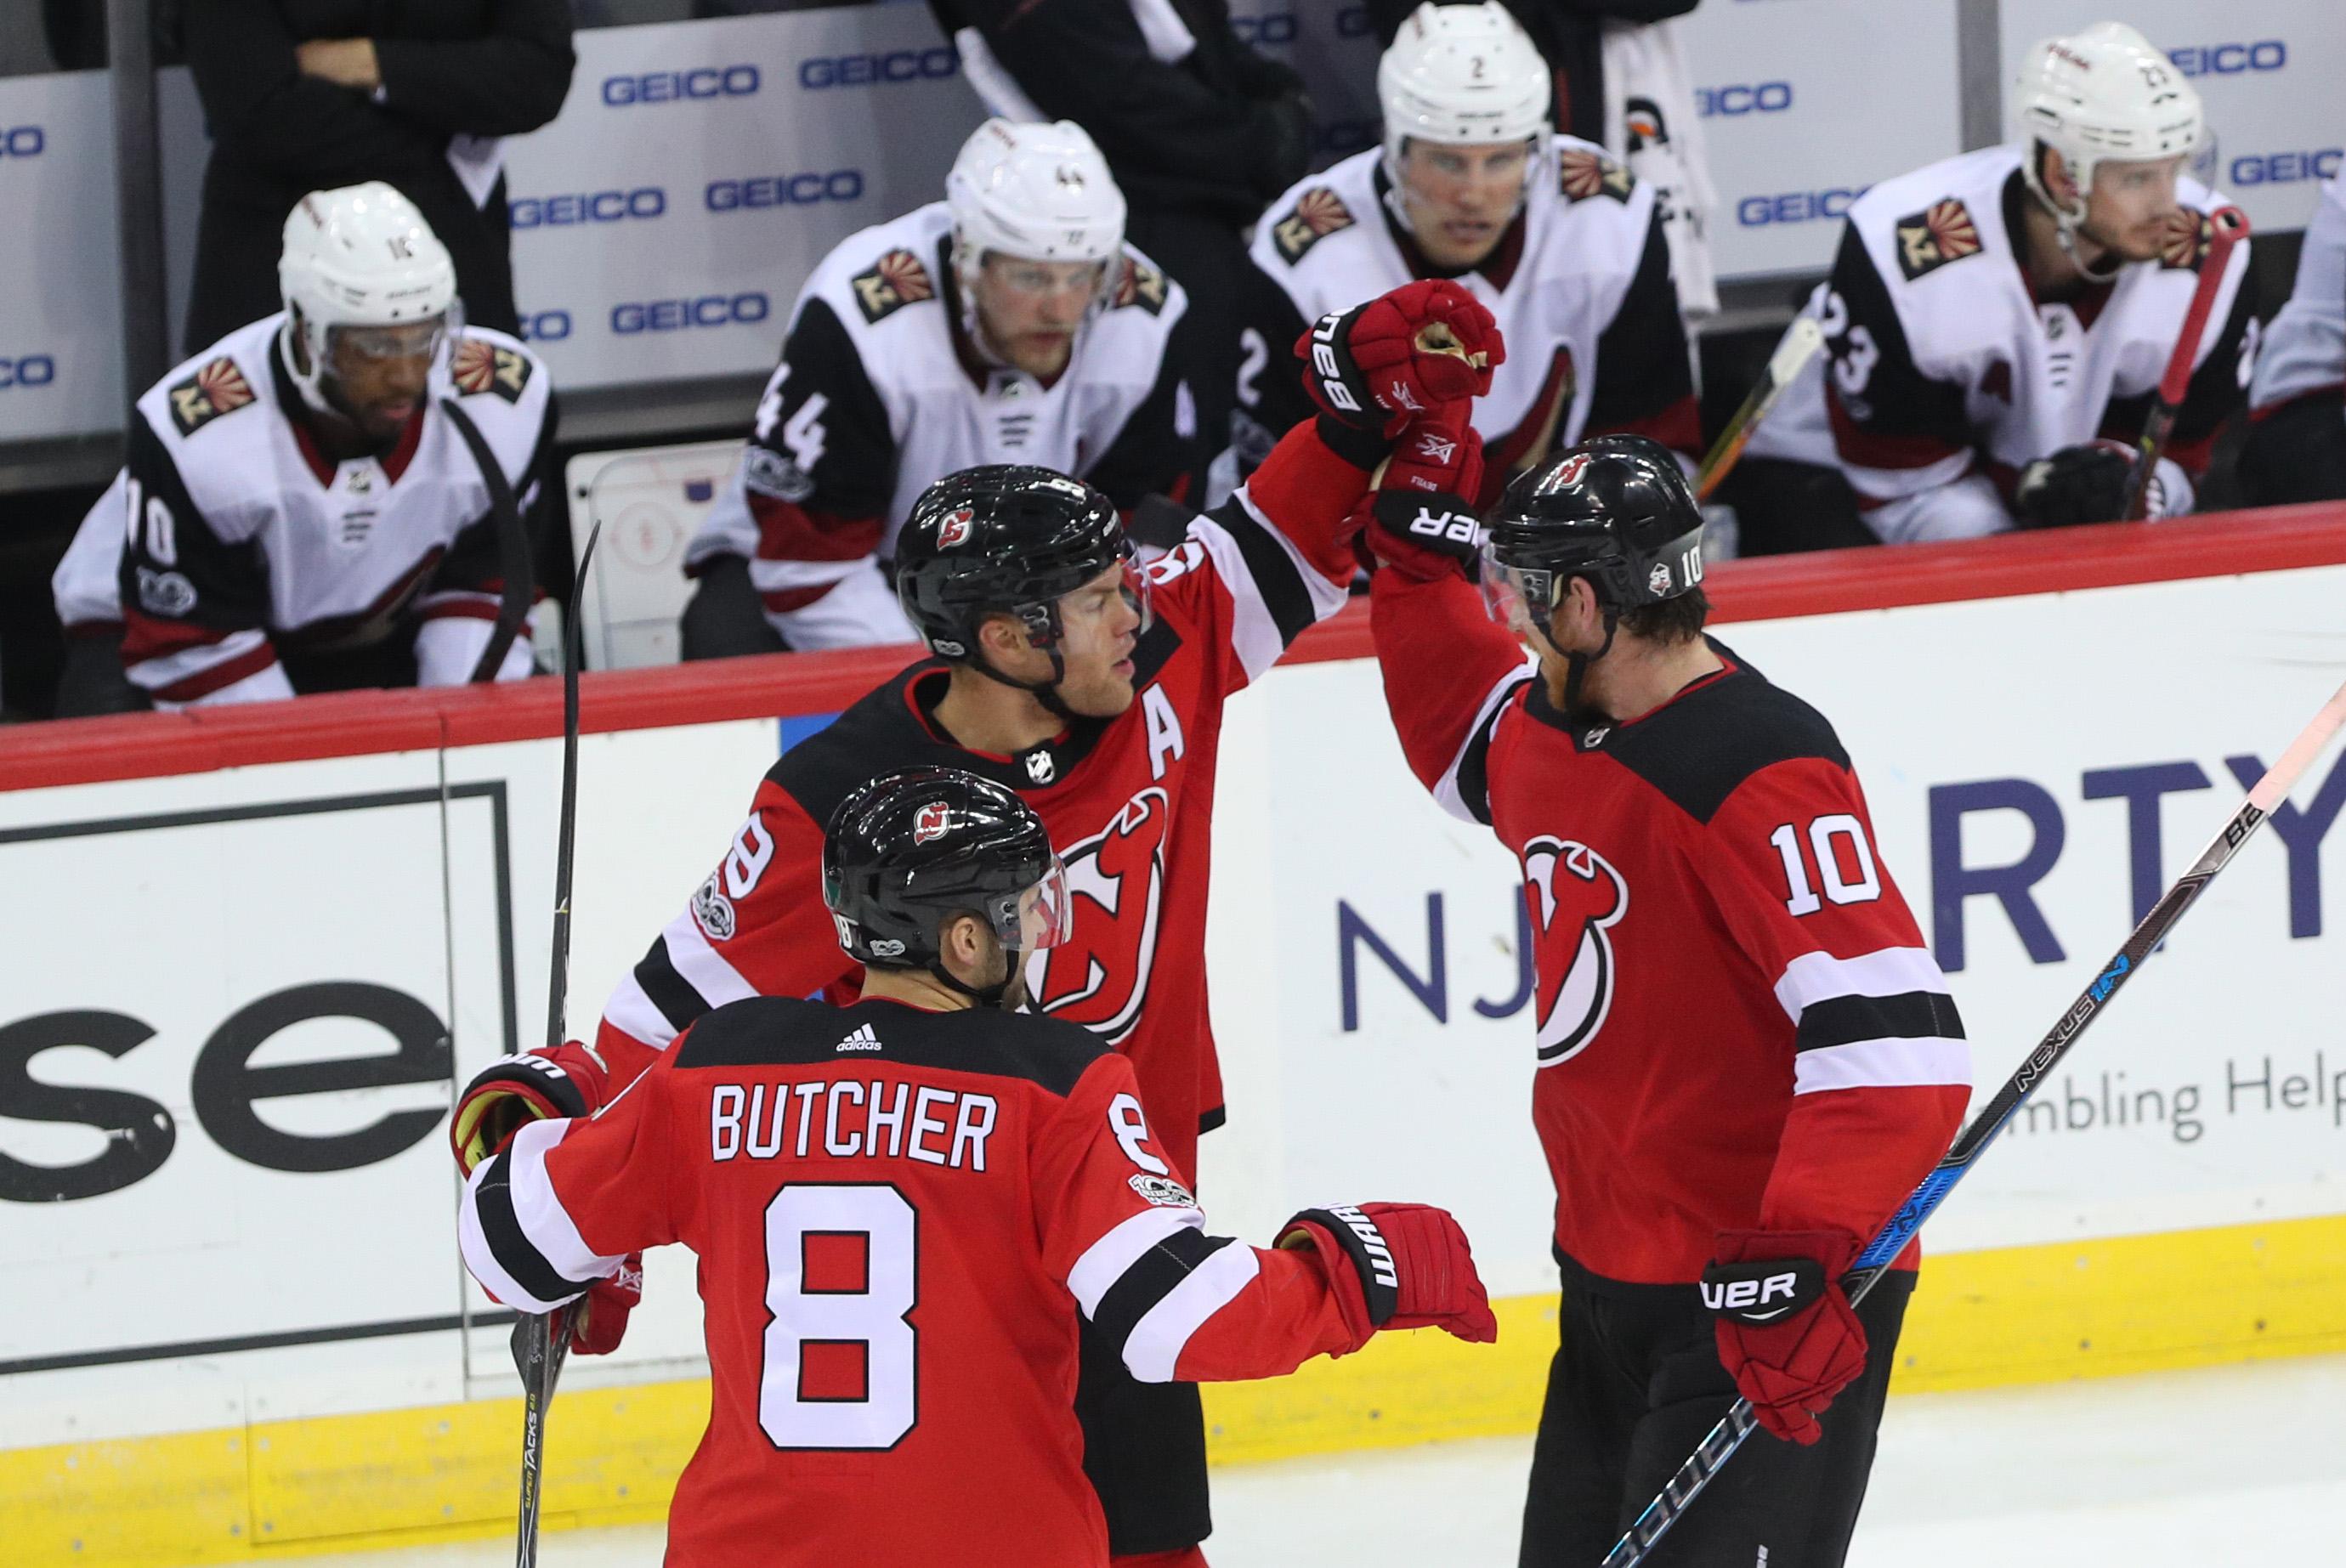 NHL: Arizona Coyotes at New Jersey Devils